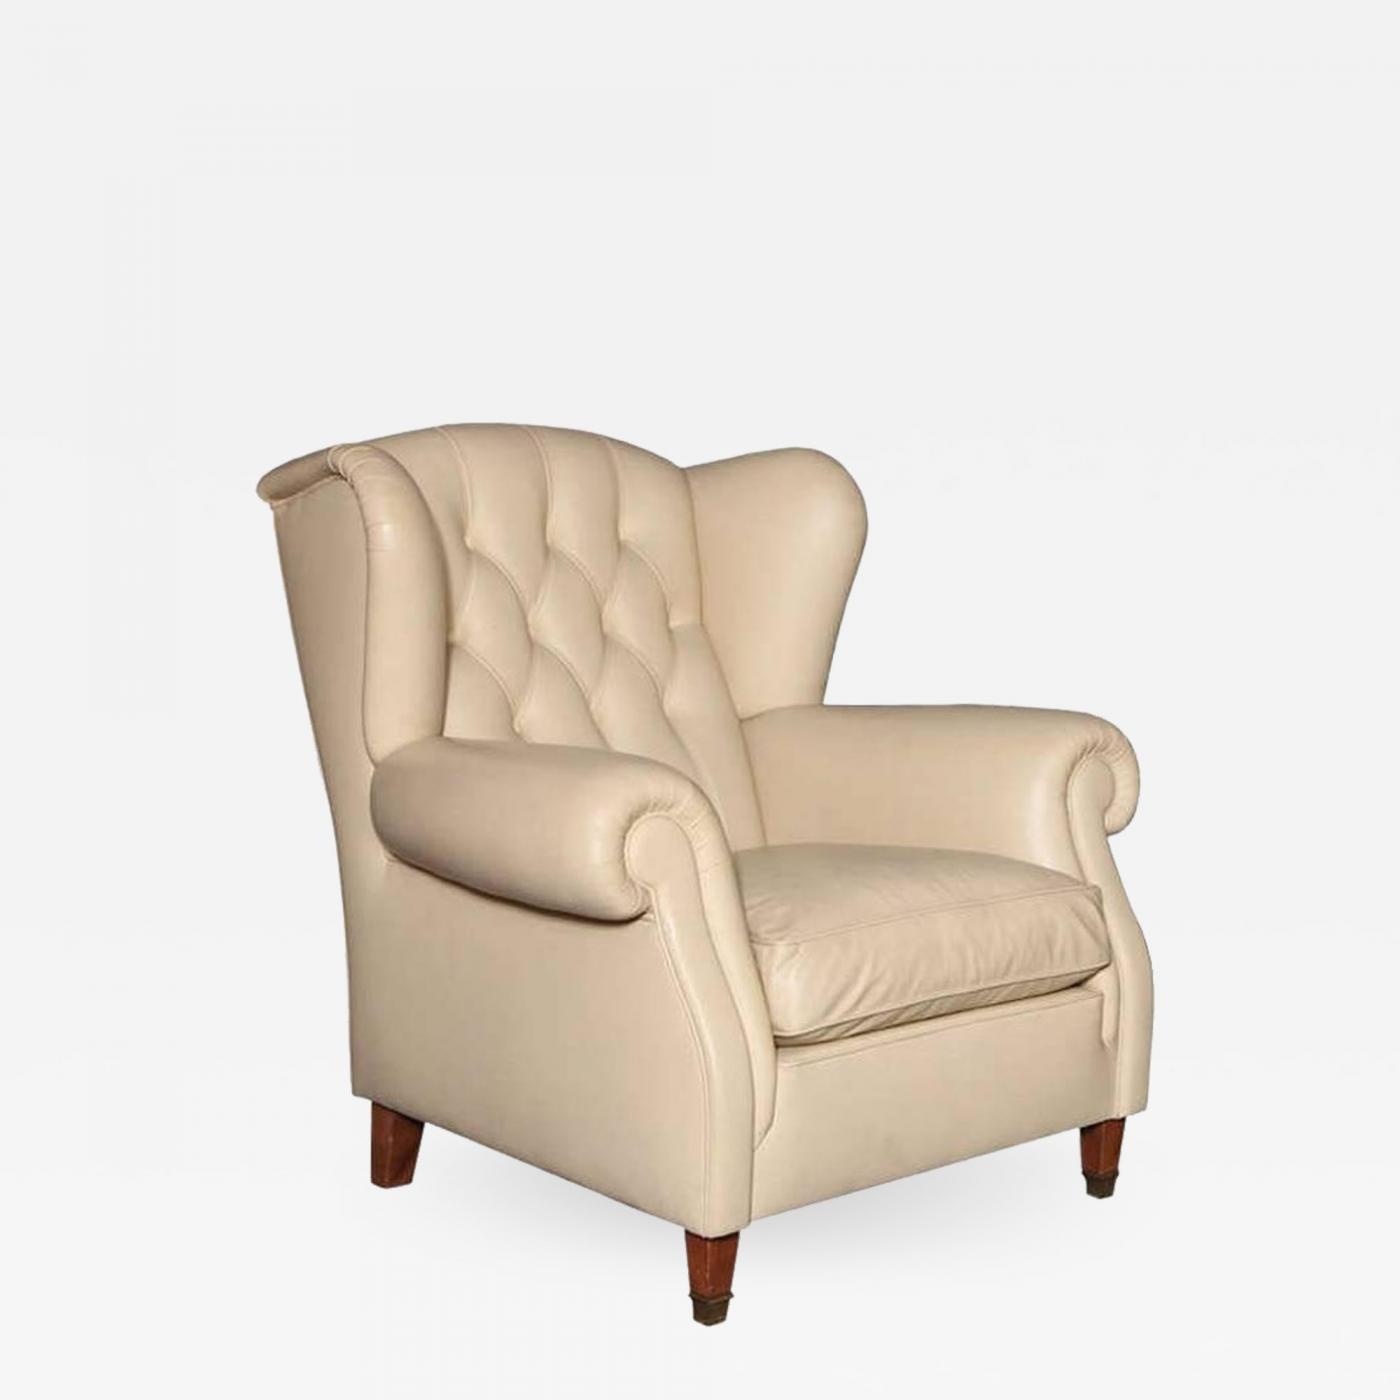 Poltrona Frau Poltrona Frau Leather Armchair